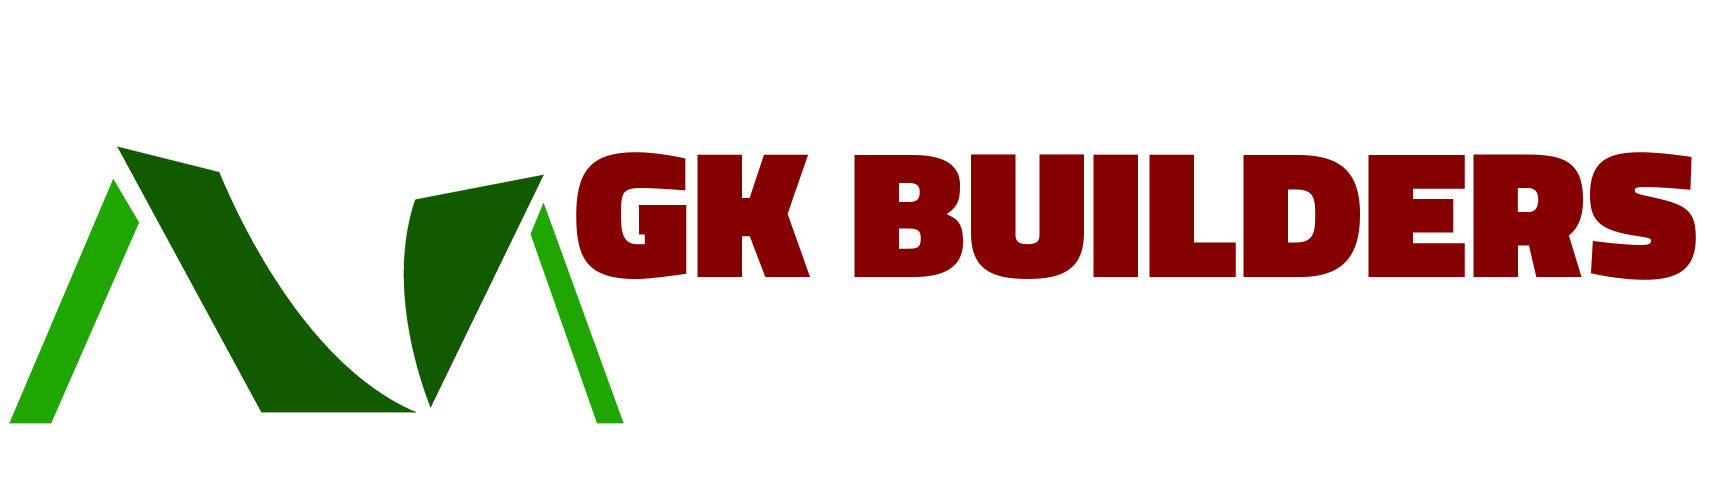 GK BUILDERS UK